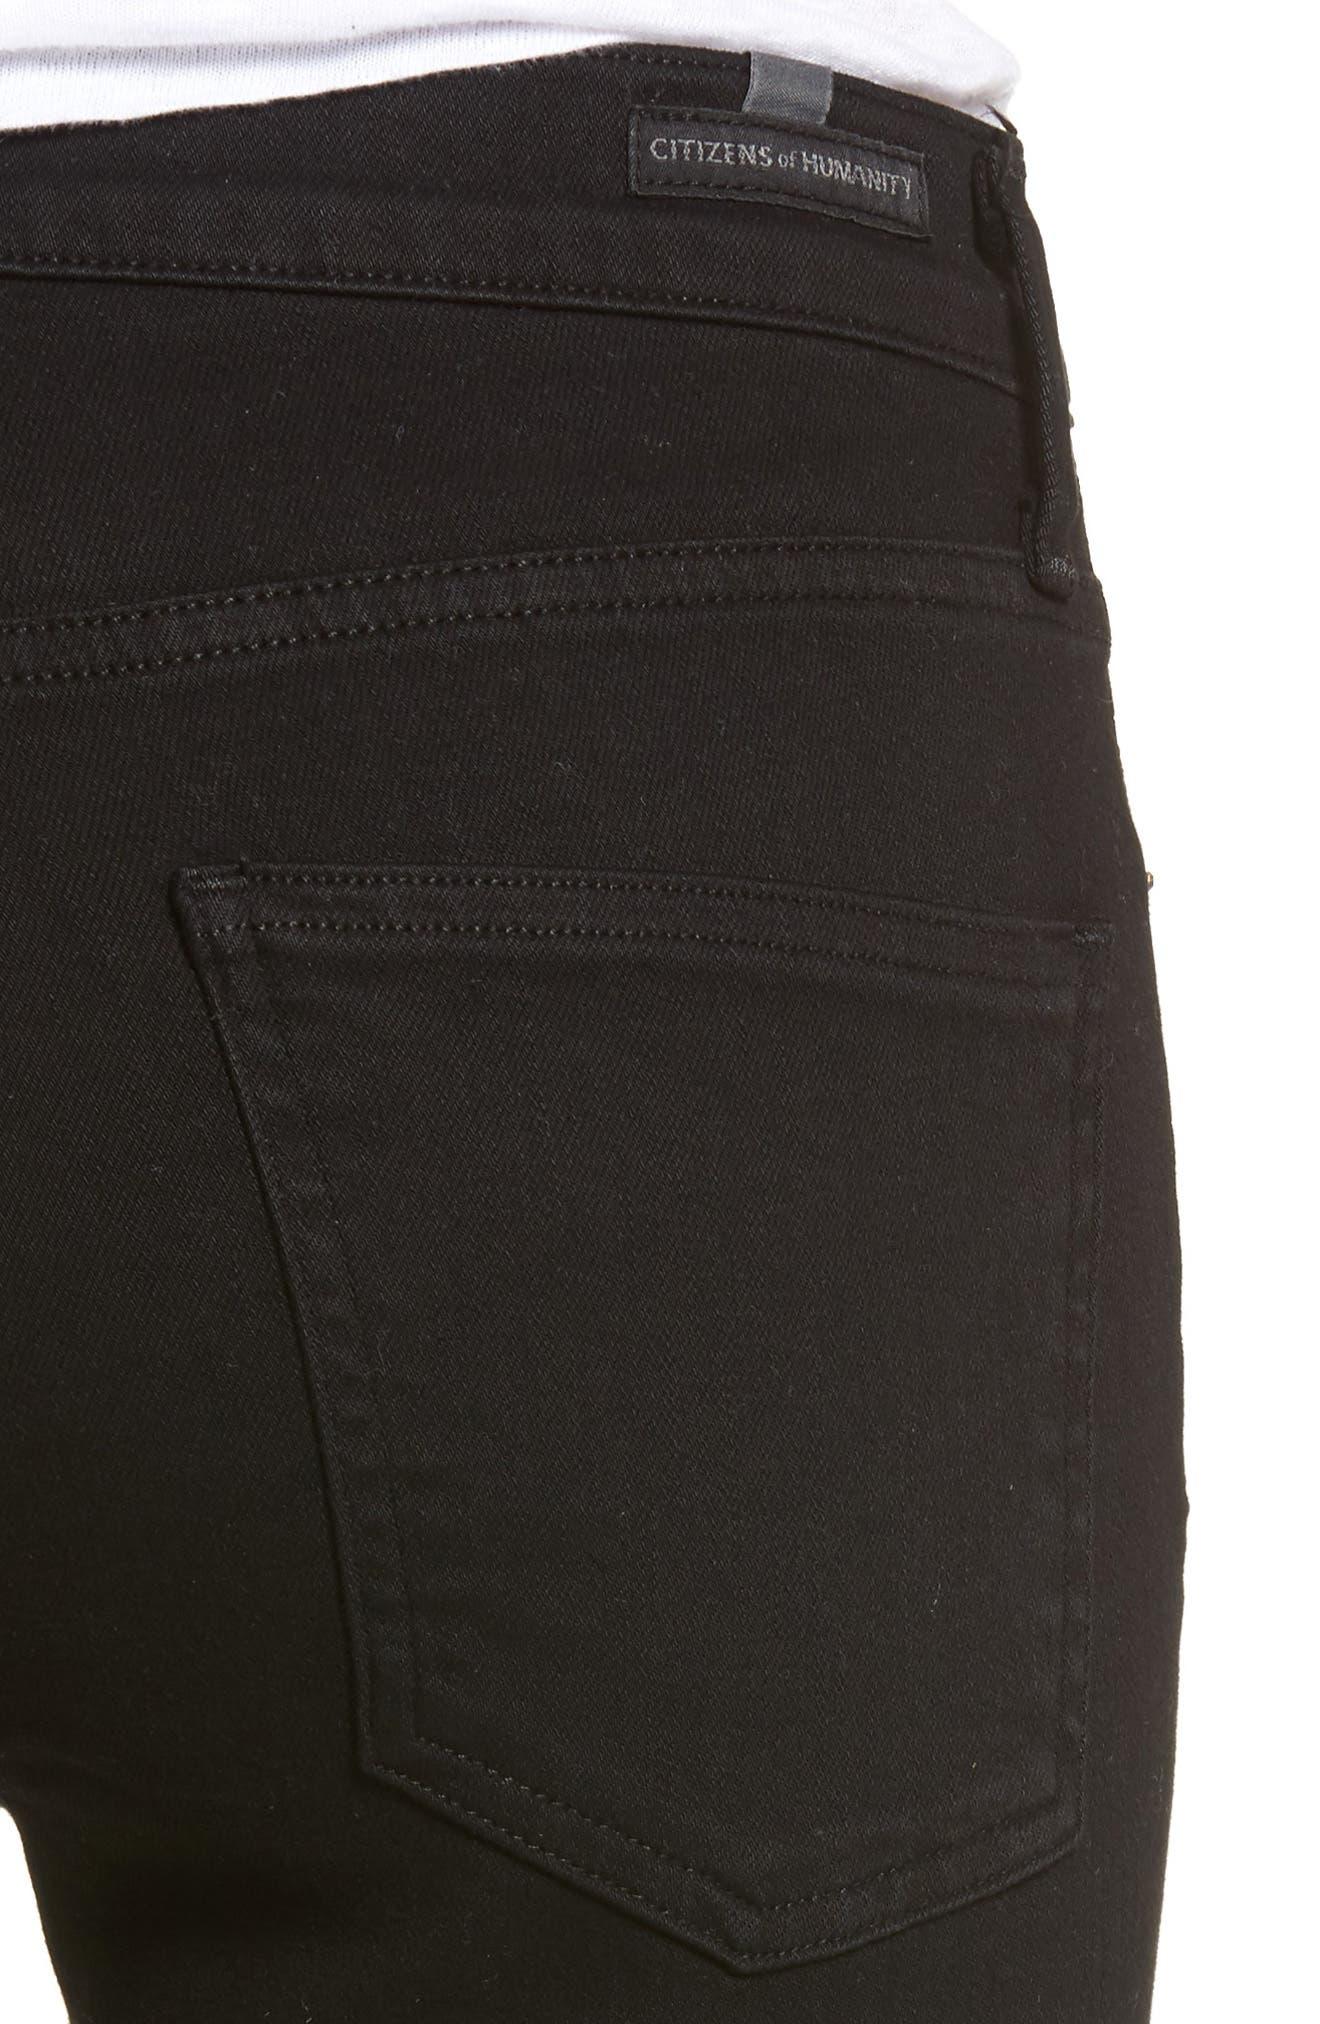 Rocket Skinny Jeans,                             Alternate thumbnail 4, color,                             010